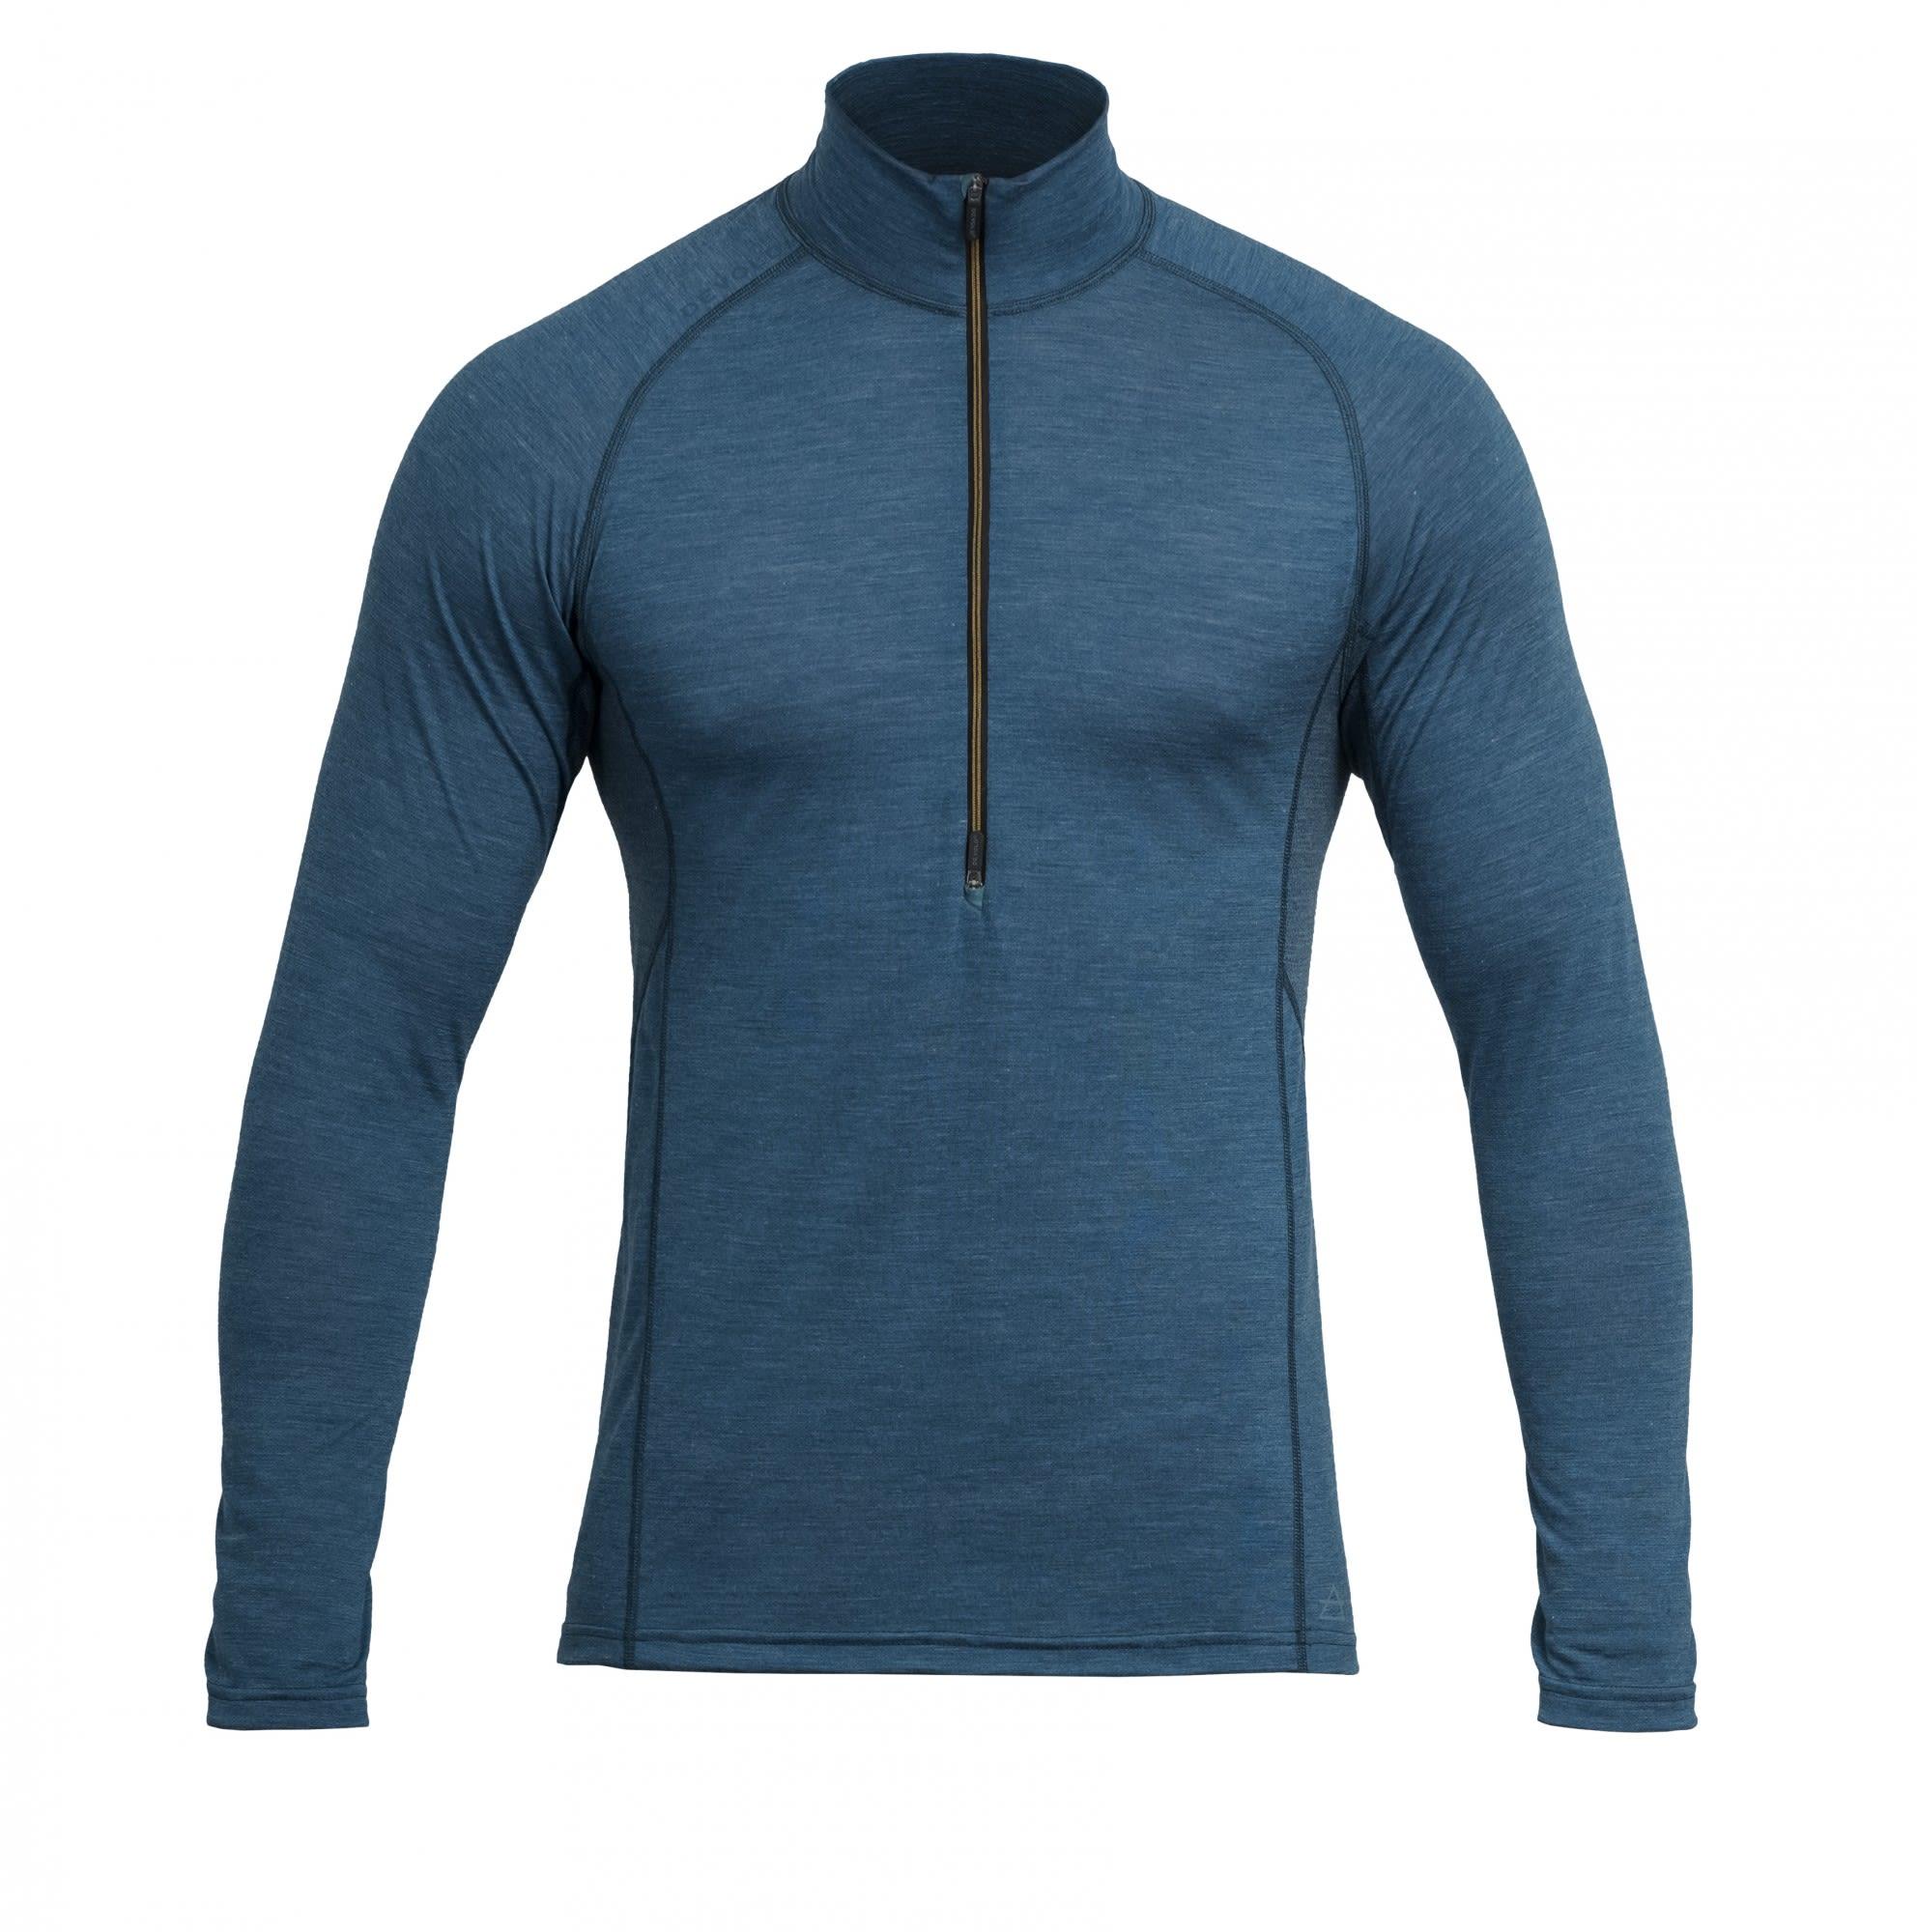 Devold Running MAN Zip Neck Blau, Male Merino S -Farbe Subsea, S